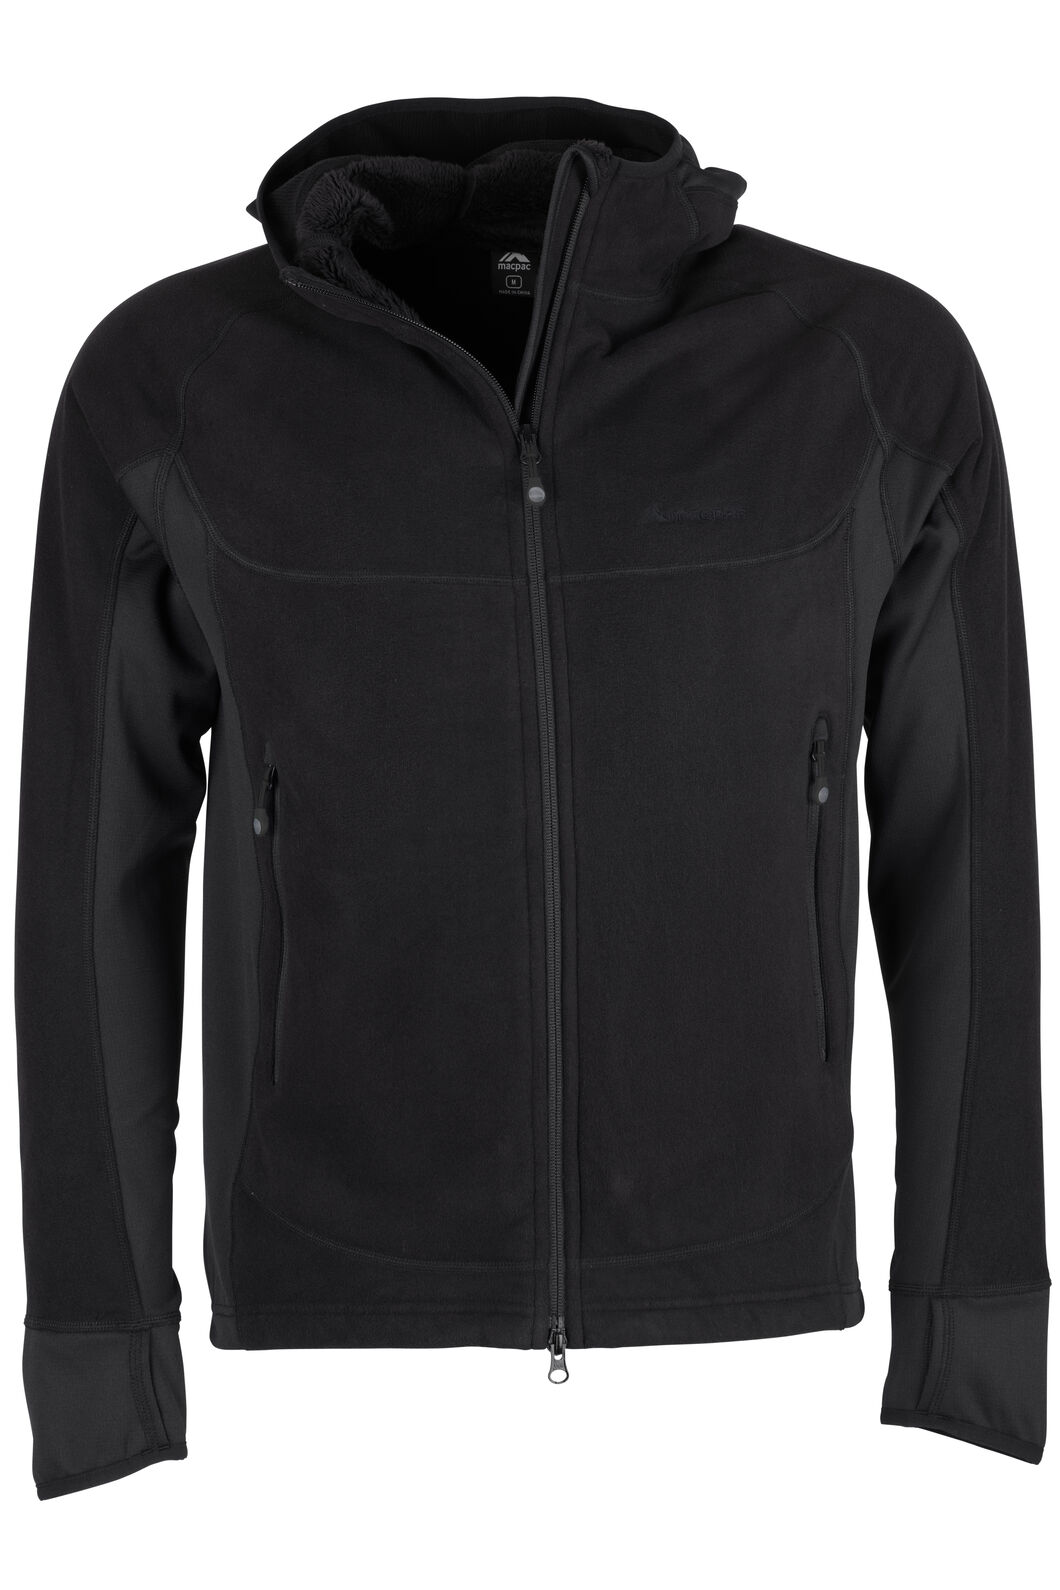 Mountain Hooded Pontetorto® Fleece Jacket - Men's, Black/Black, hi-res